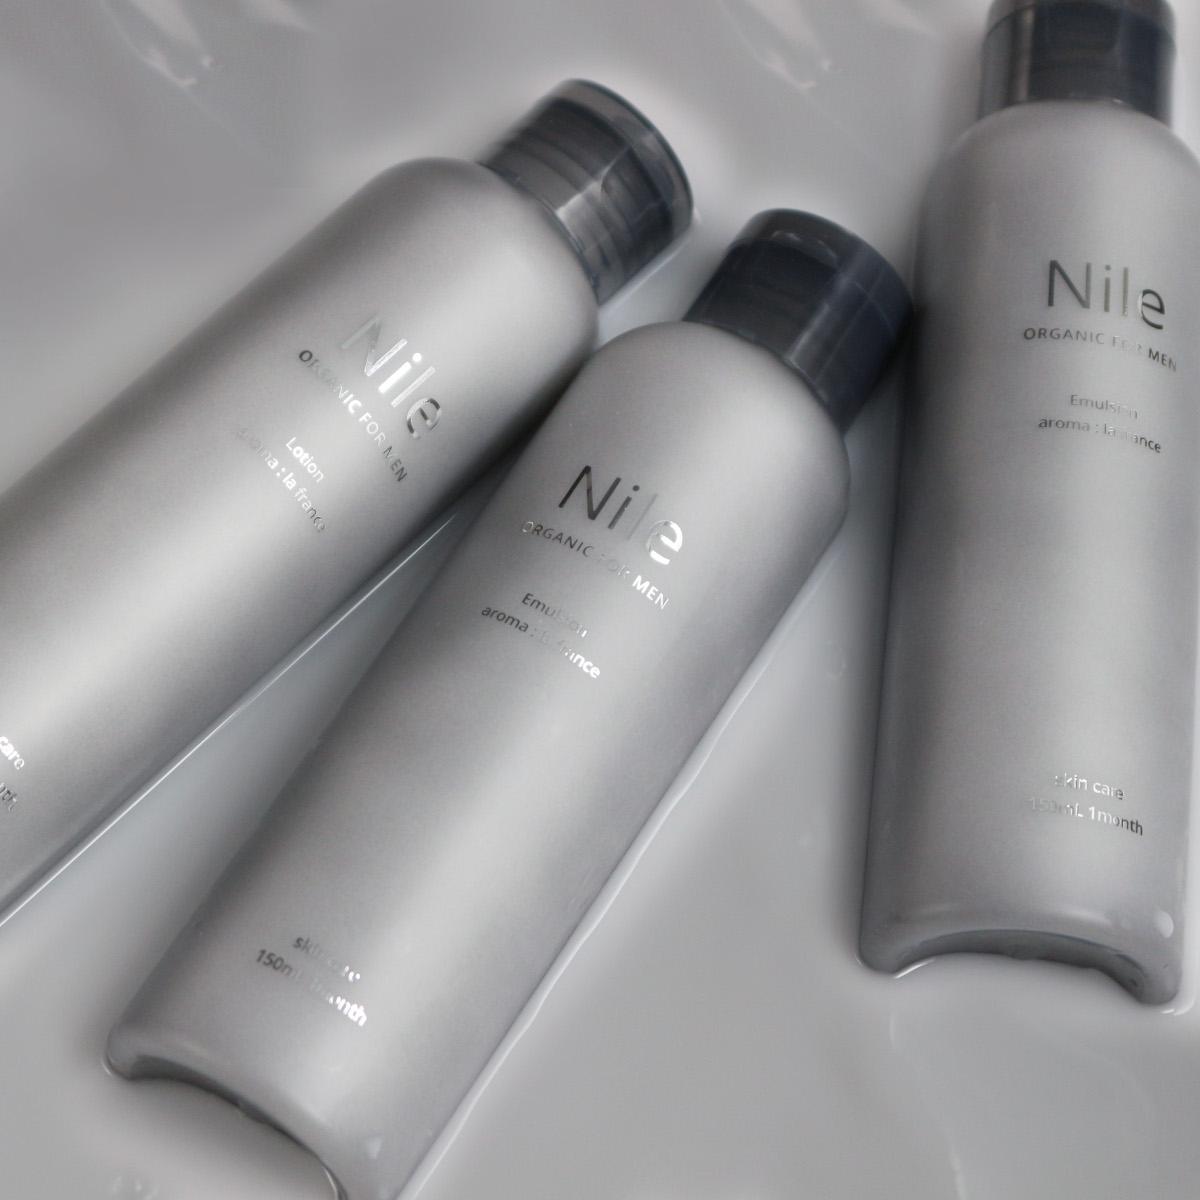 Nile 乳液 保湿 メンズ セラミド アロエ配合 敏感 半額 幸せラボ スキンケア 乾燥肌 送料無料 潤い ナイル アウトレット フェイスオイル150mL